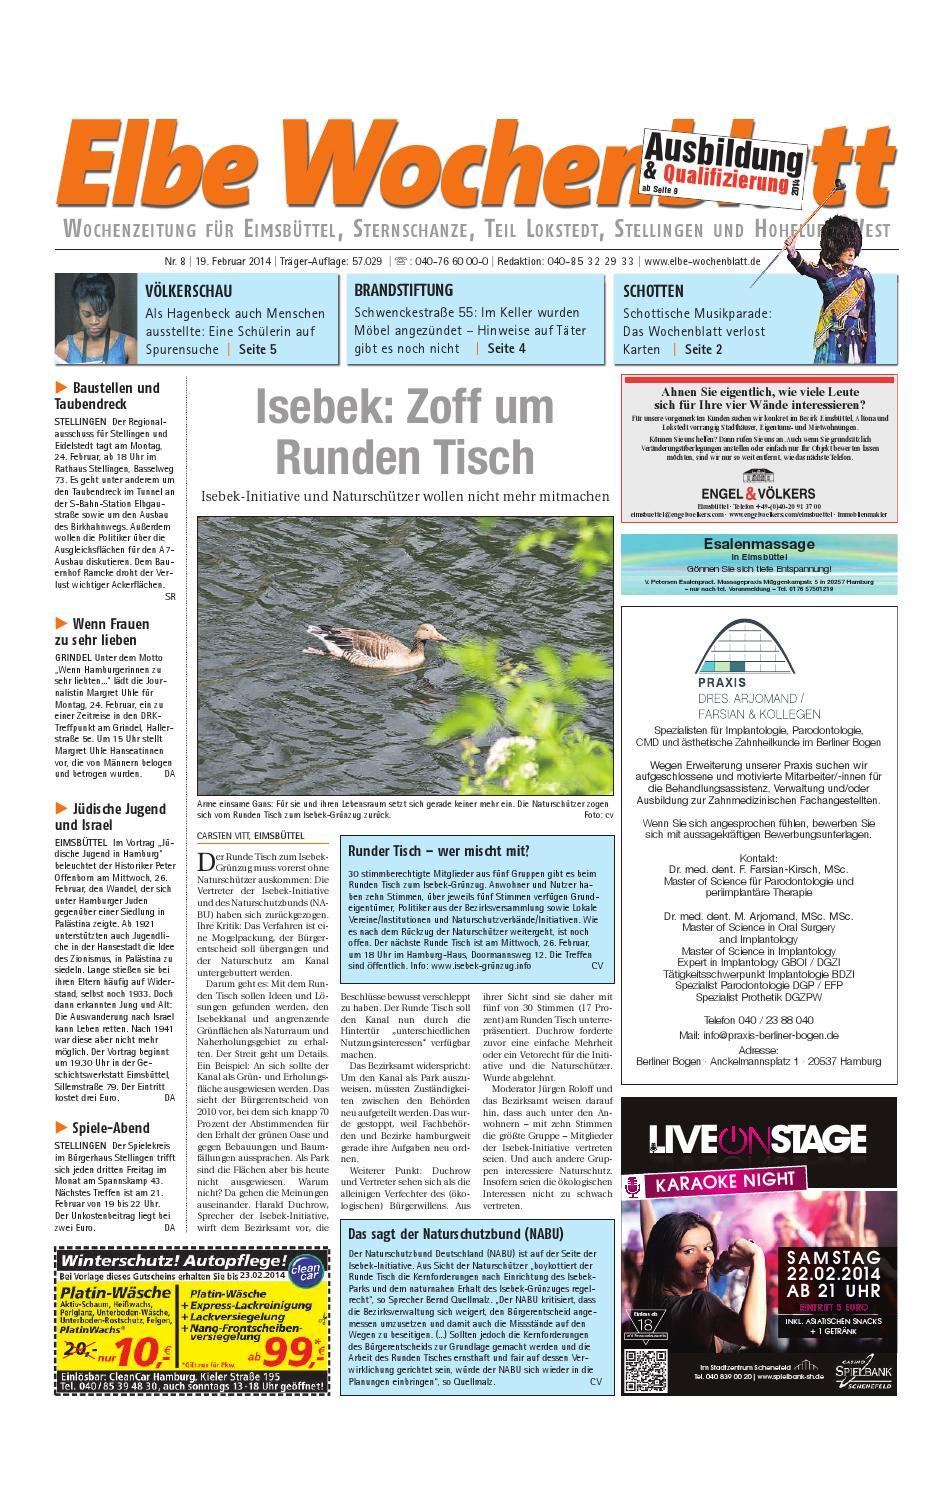 Eimsbüttel KW08 2014 by Elbe Wochenblatt Verlagsgesellschaft